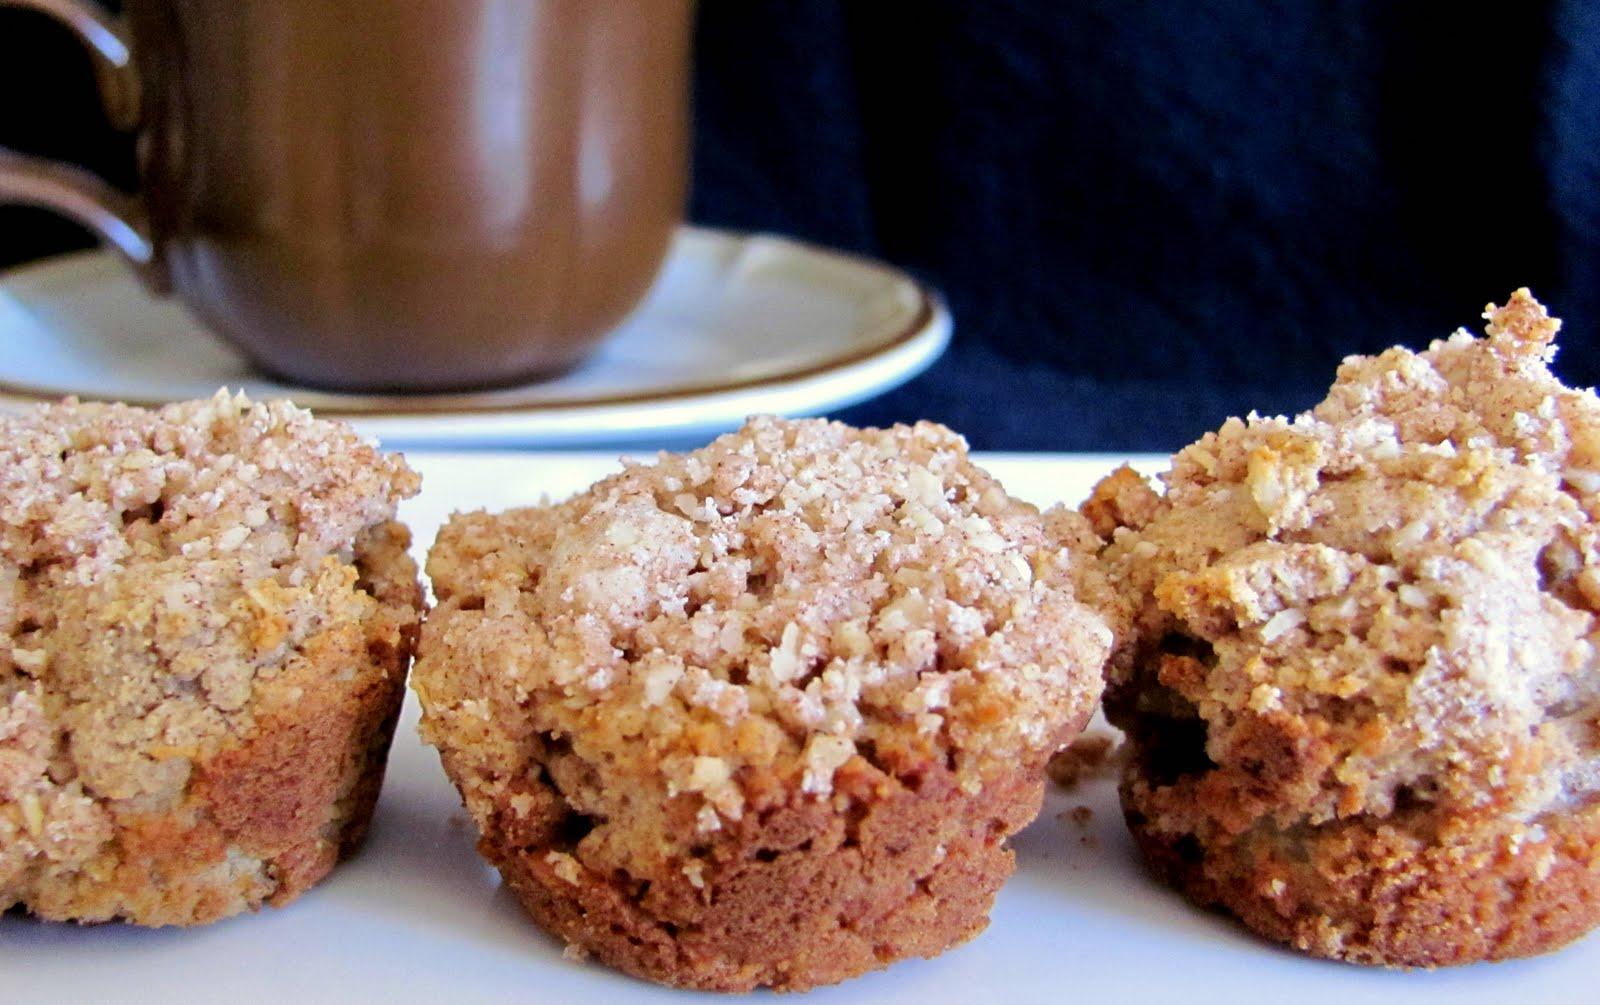 ... Distinctive Diabetic Recipes: Mini Cinnamon Streusel Coffee Cakes